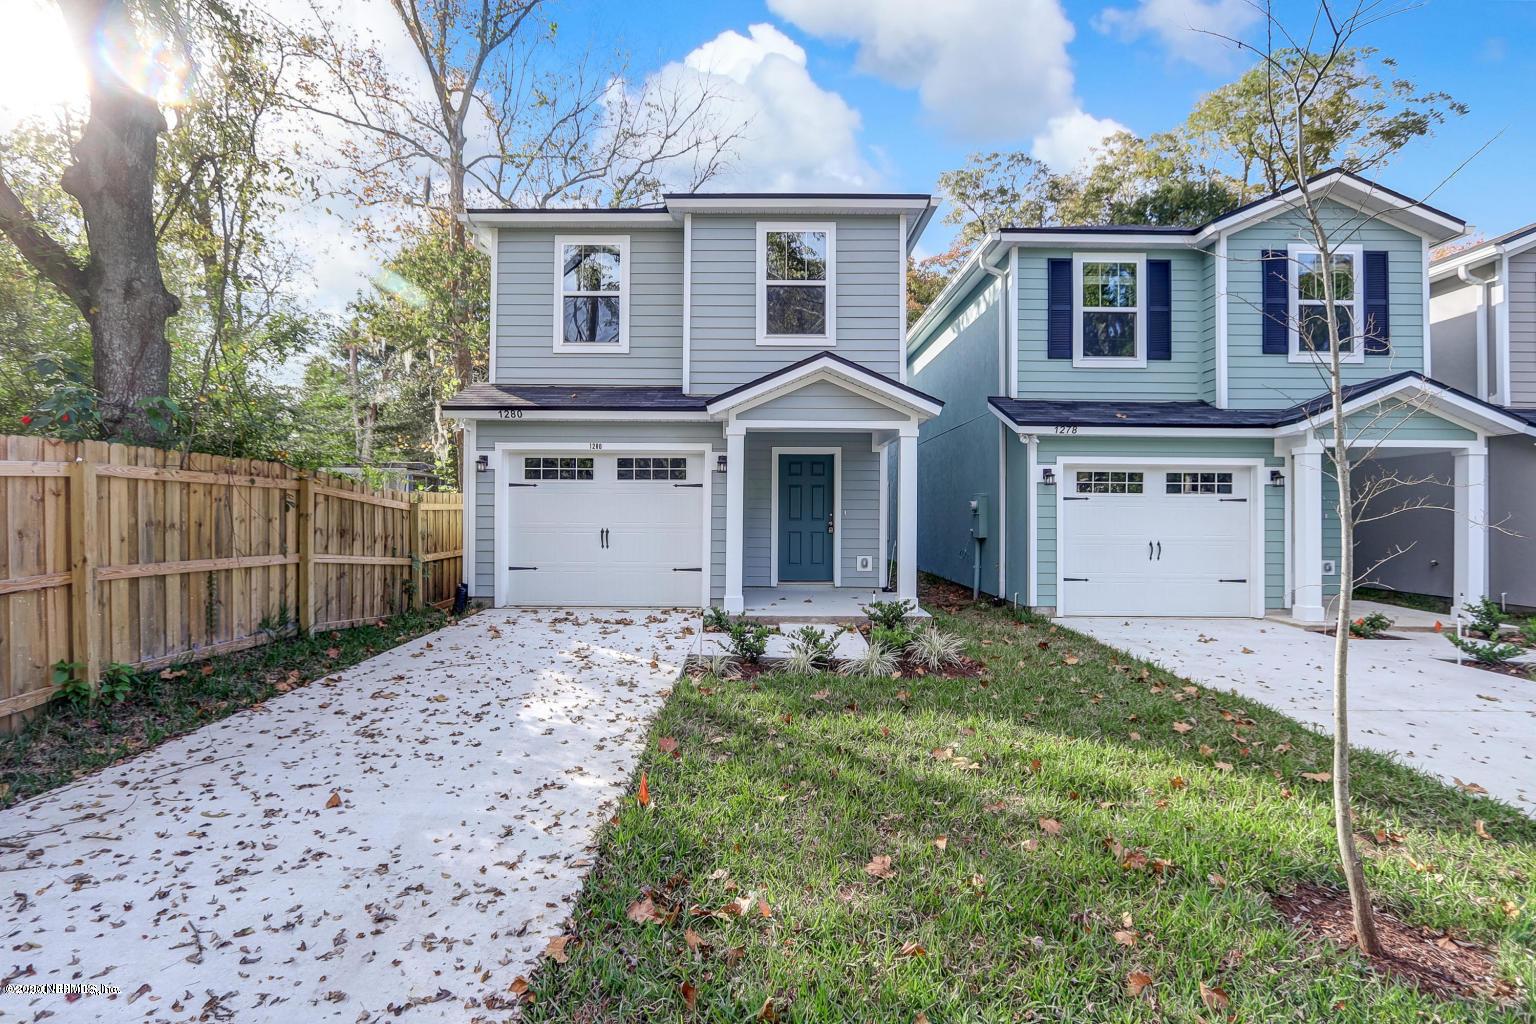 1298 Lake Shore Blvd Jacksonville, FL 32205